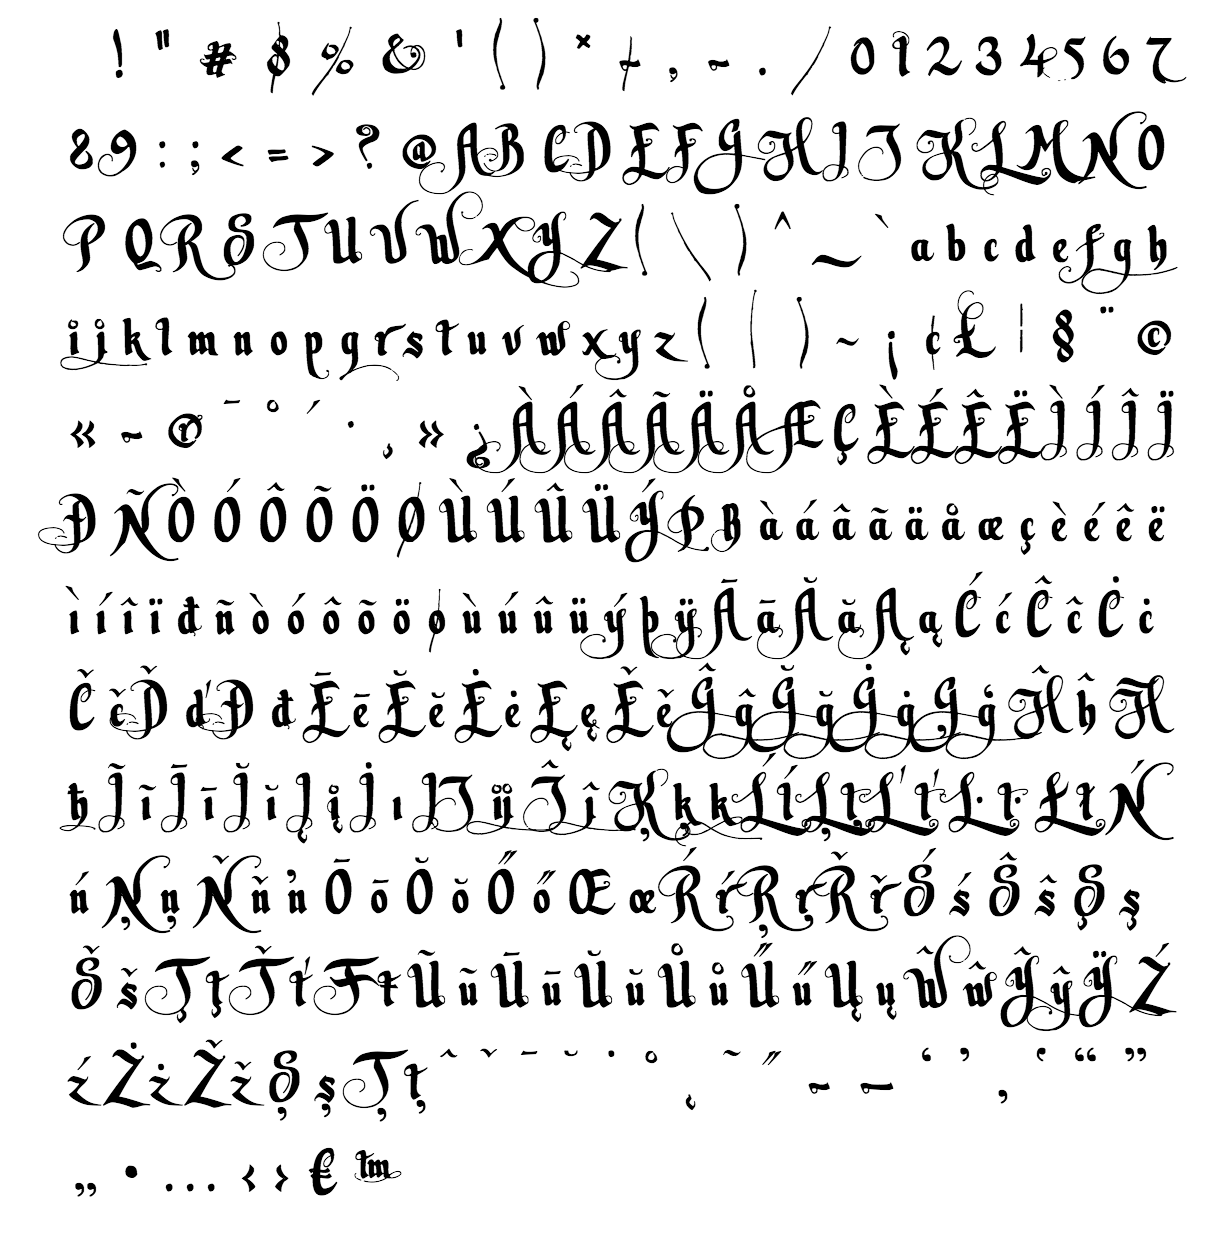 leitmotiv font - complete character list